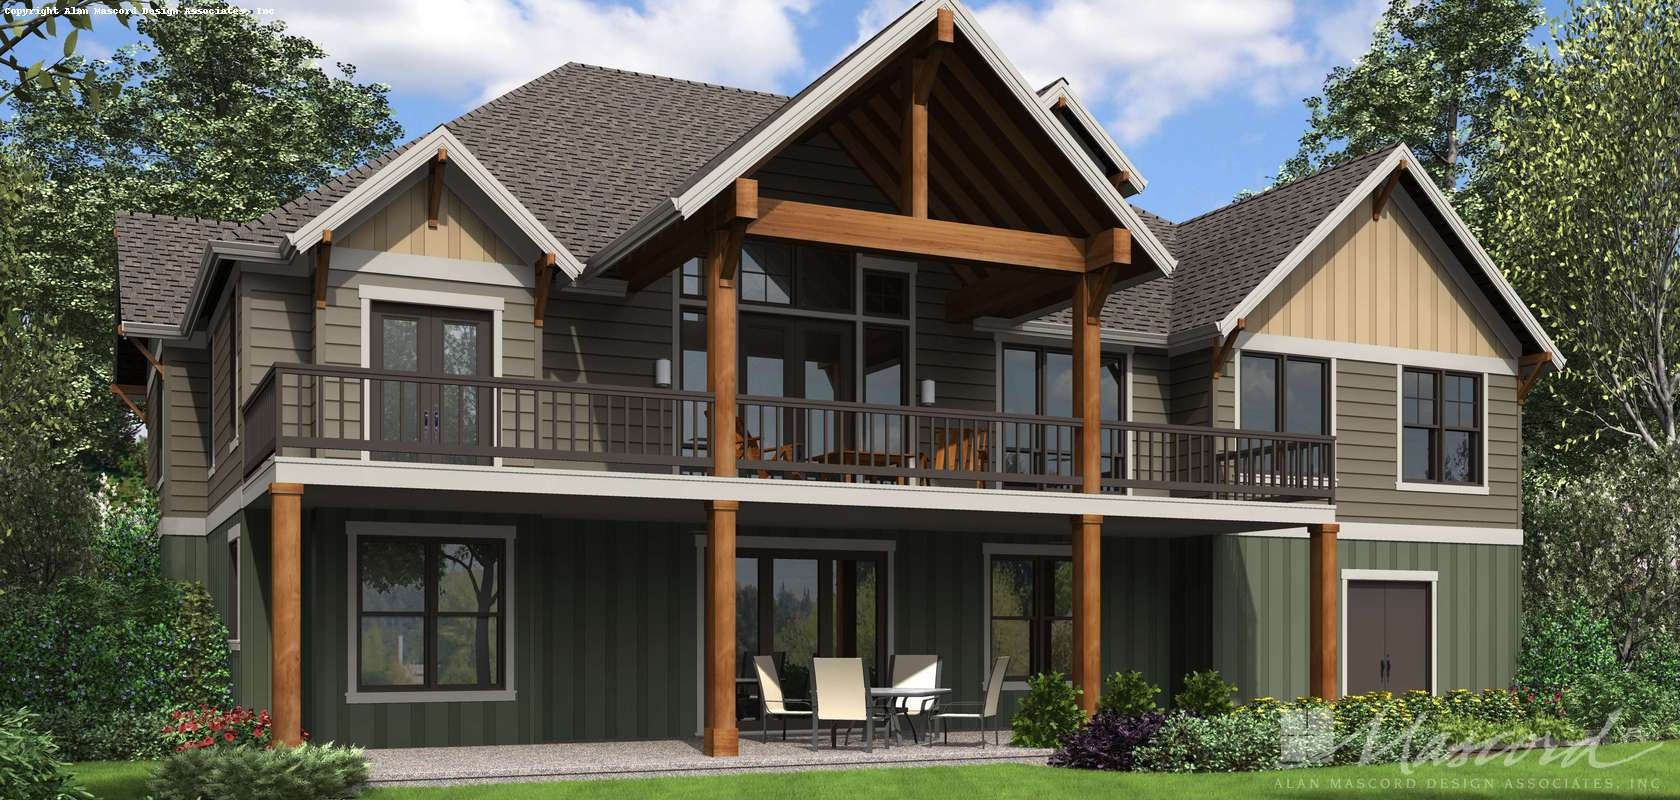 Mascord House Plan 1416: The St Louis